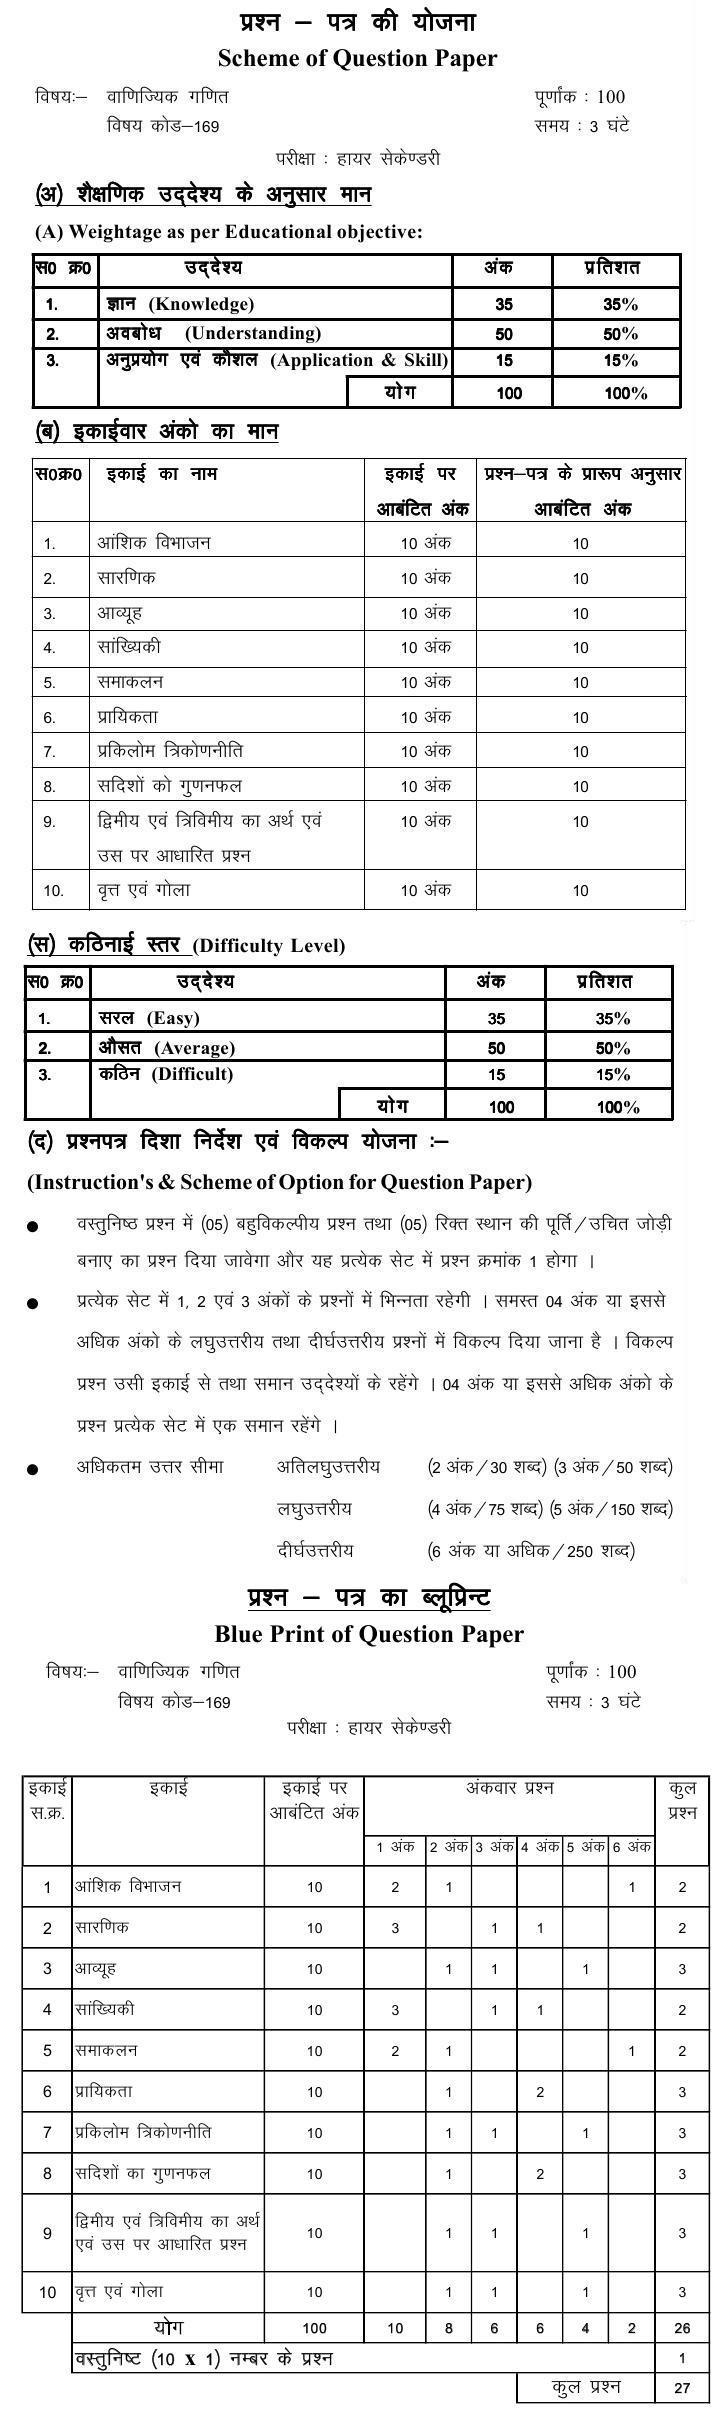 Chattisgarh Board Class 12 Scheme and Blue Print of Occupational Mathematics (Vyavasayik Ganit)